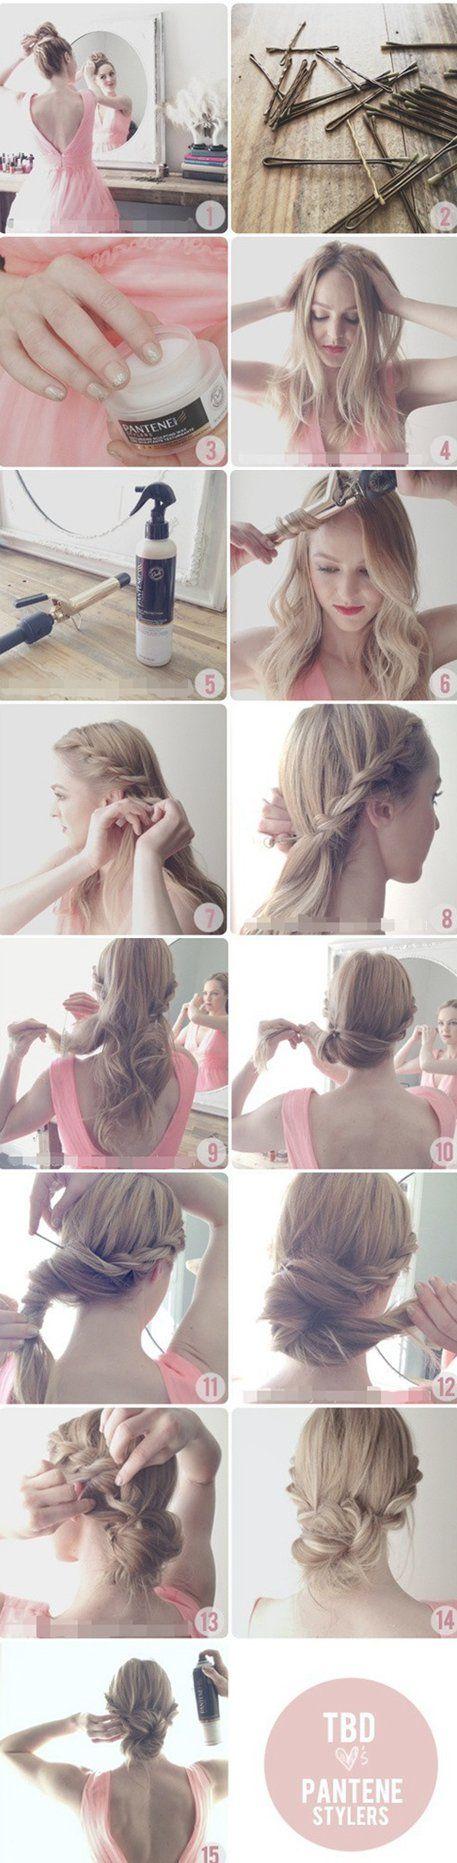 updo hairstyles for medium hair braided updo